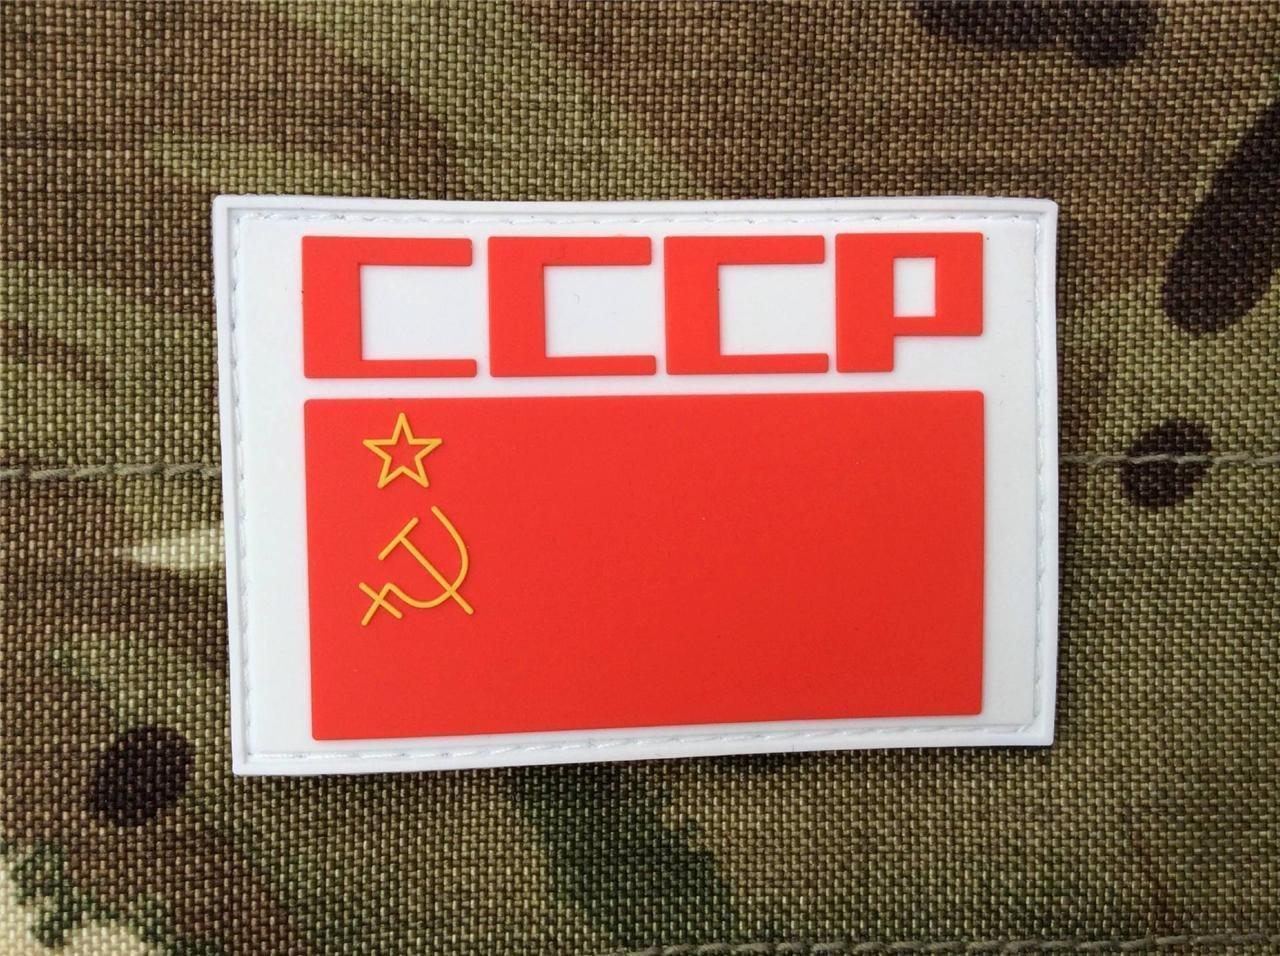 Parche Bandera de la CCCP Unión Soviética Estilo Retro - Airsoft Velcro Patch Nation